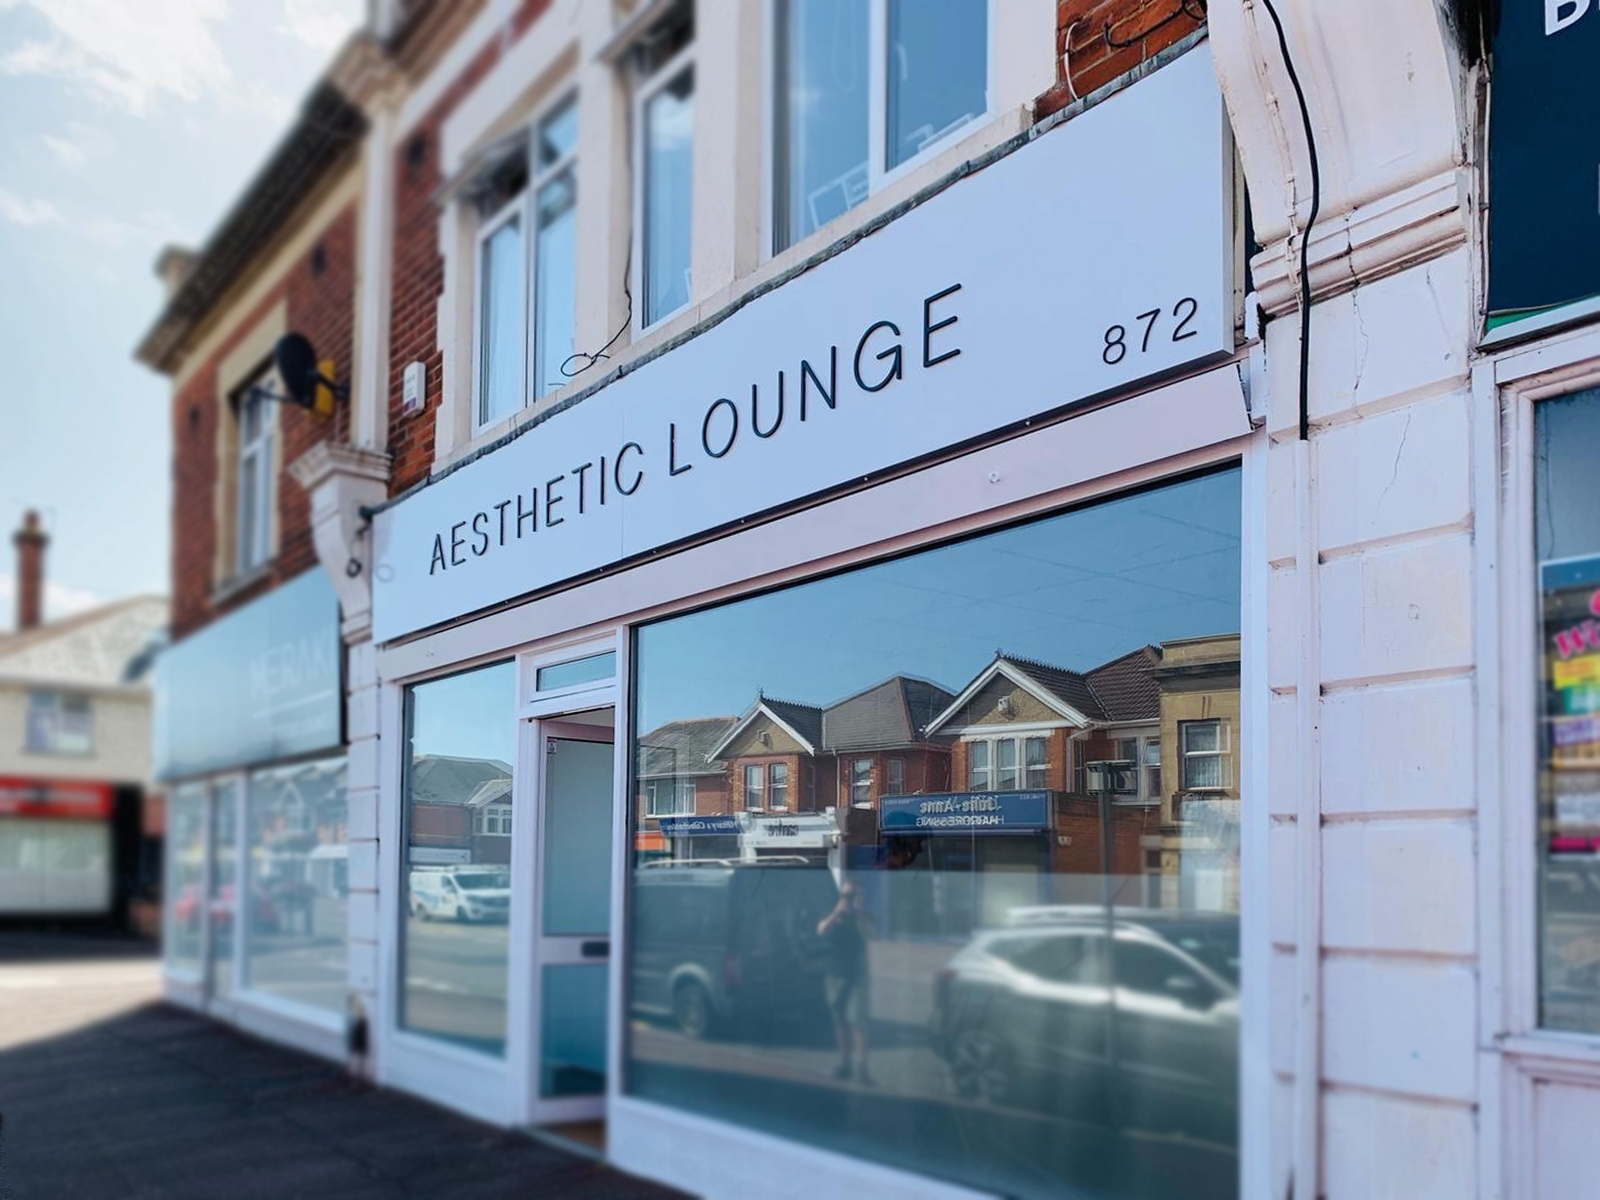 Aesthetic Lounge.jpg